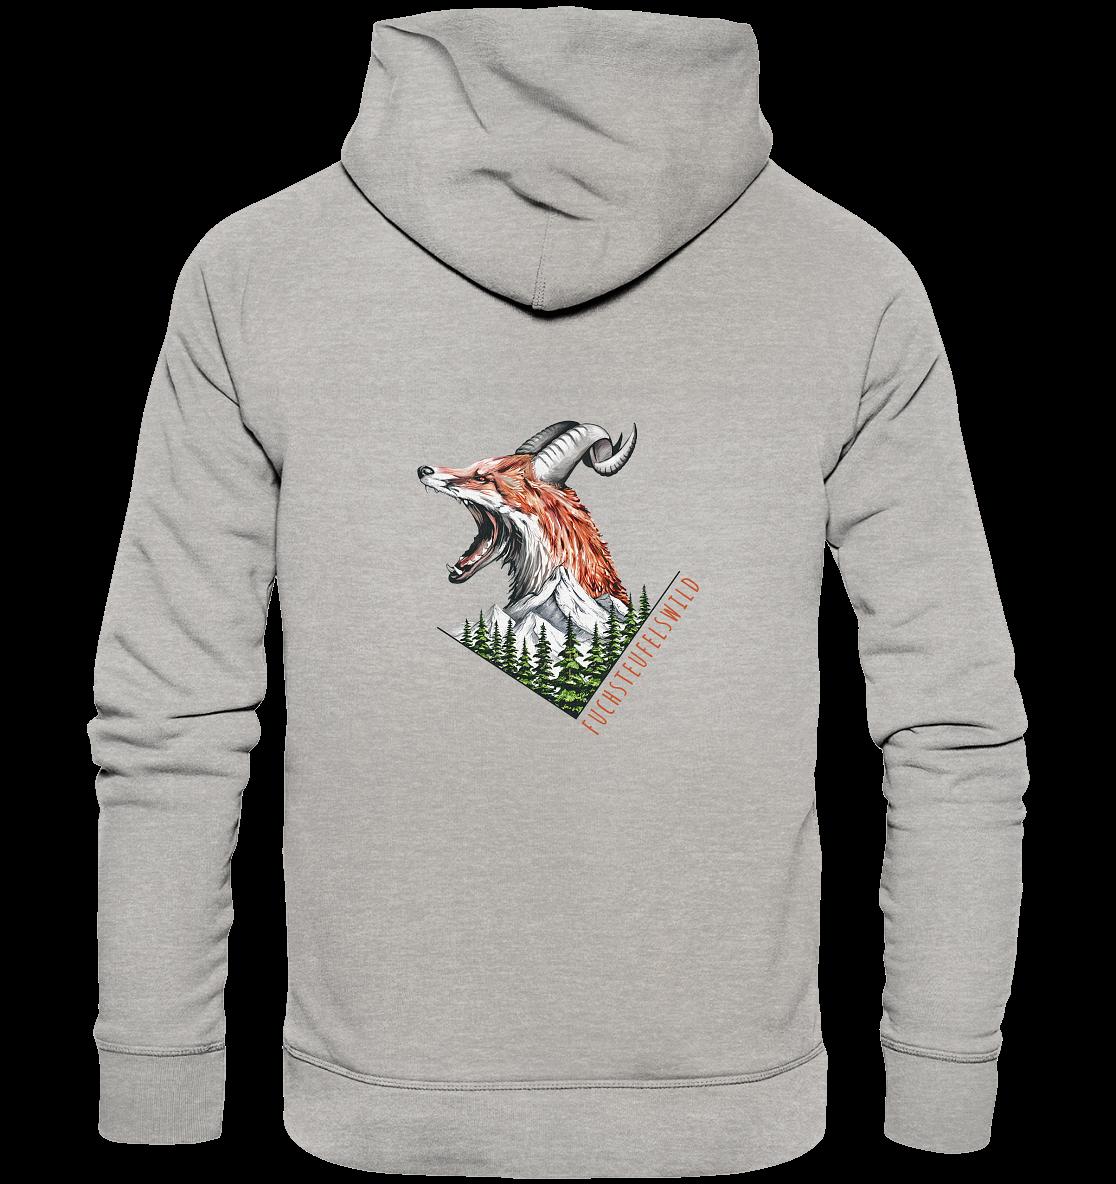 back-organic-hoodie-c2c1c0-1116x.png